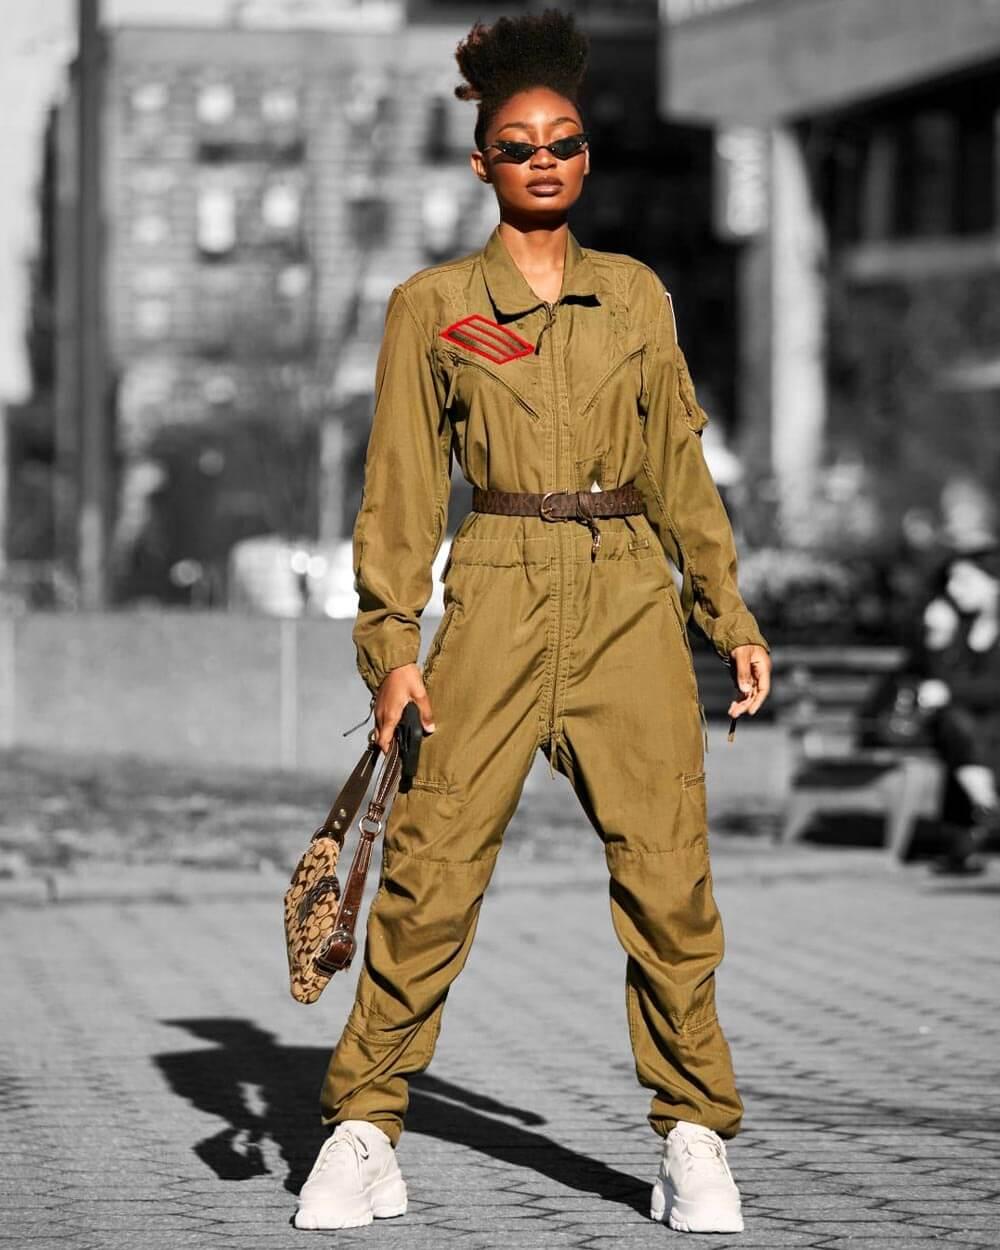 Boiler suits fashion trends 2021